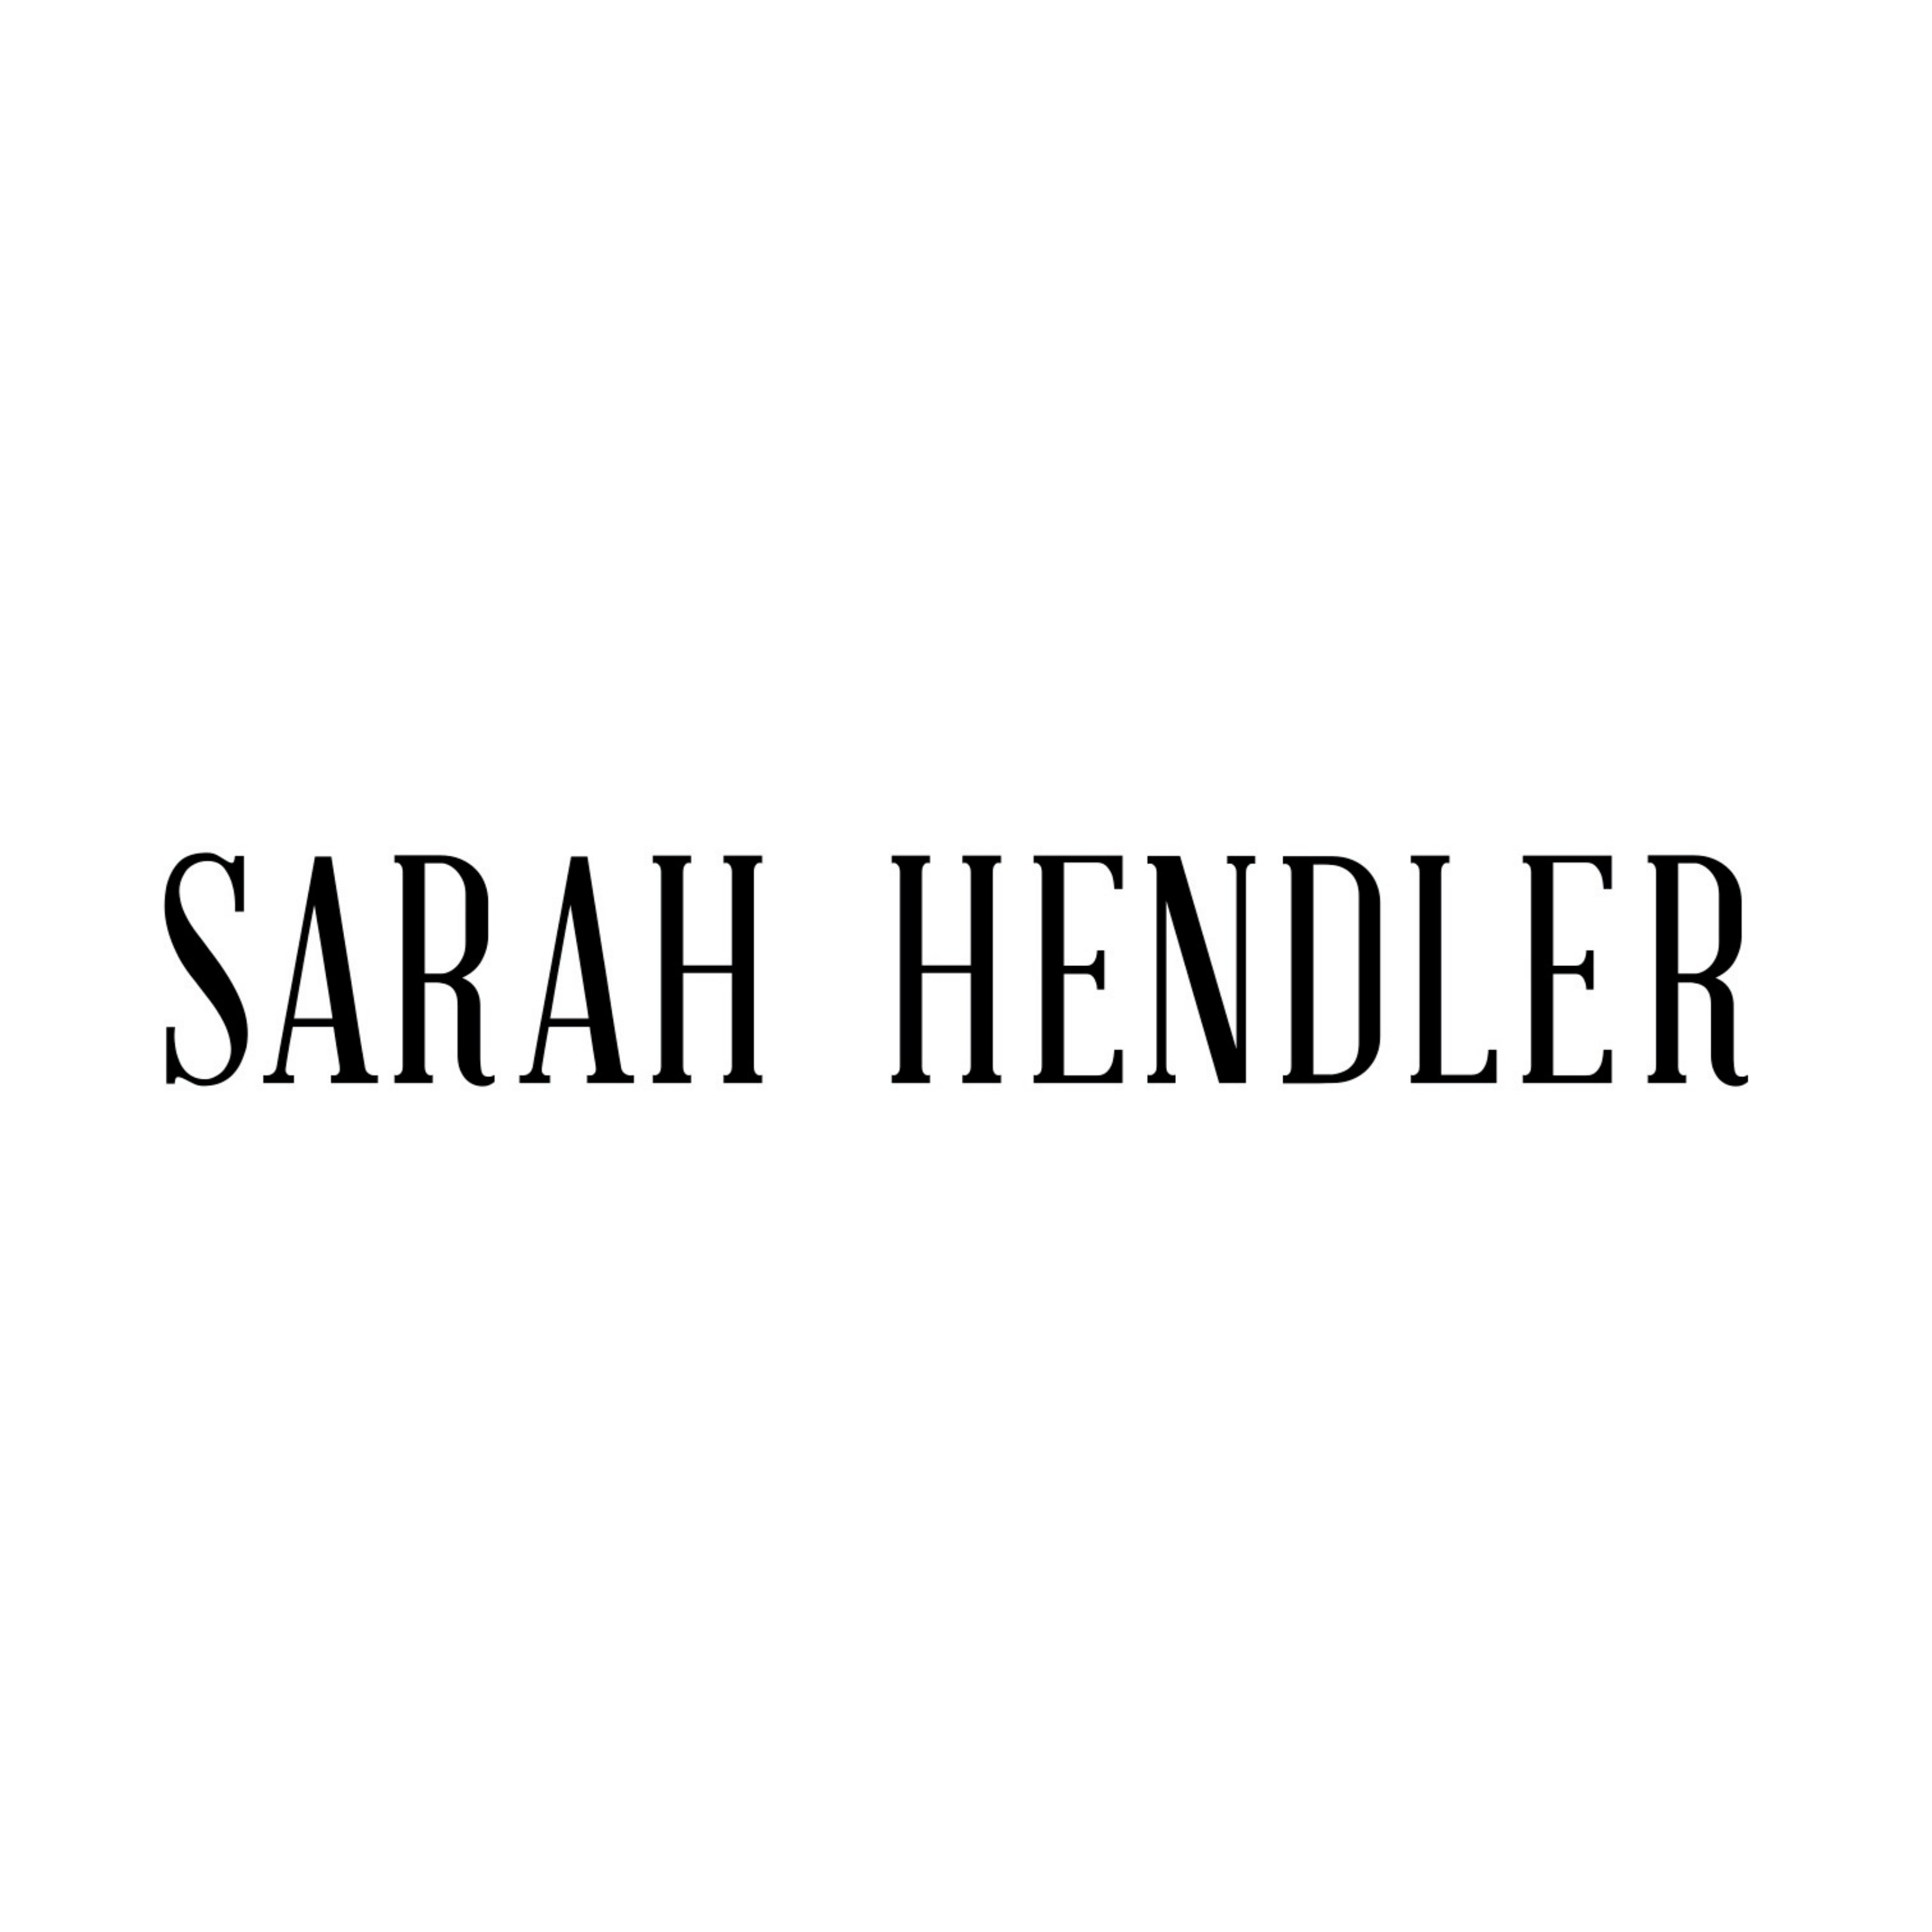 Sarah Hendler